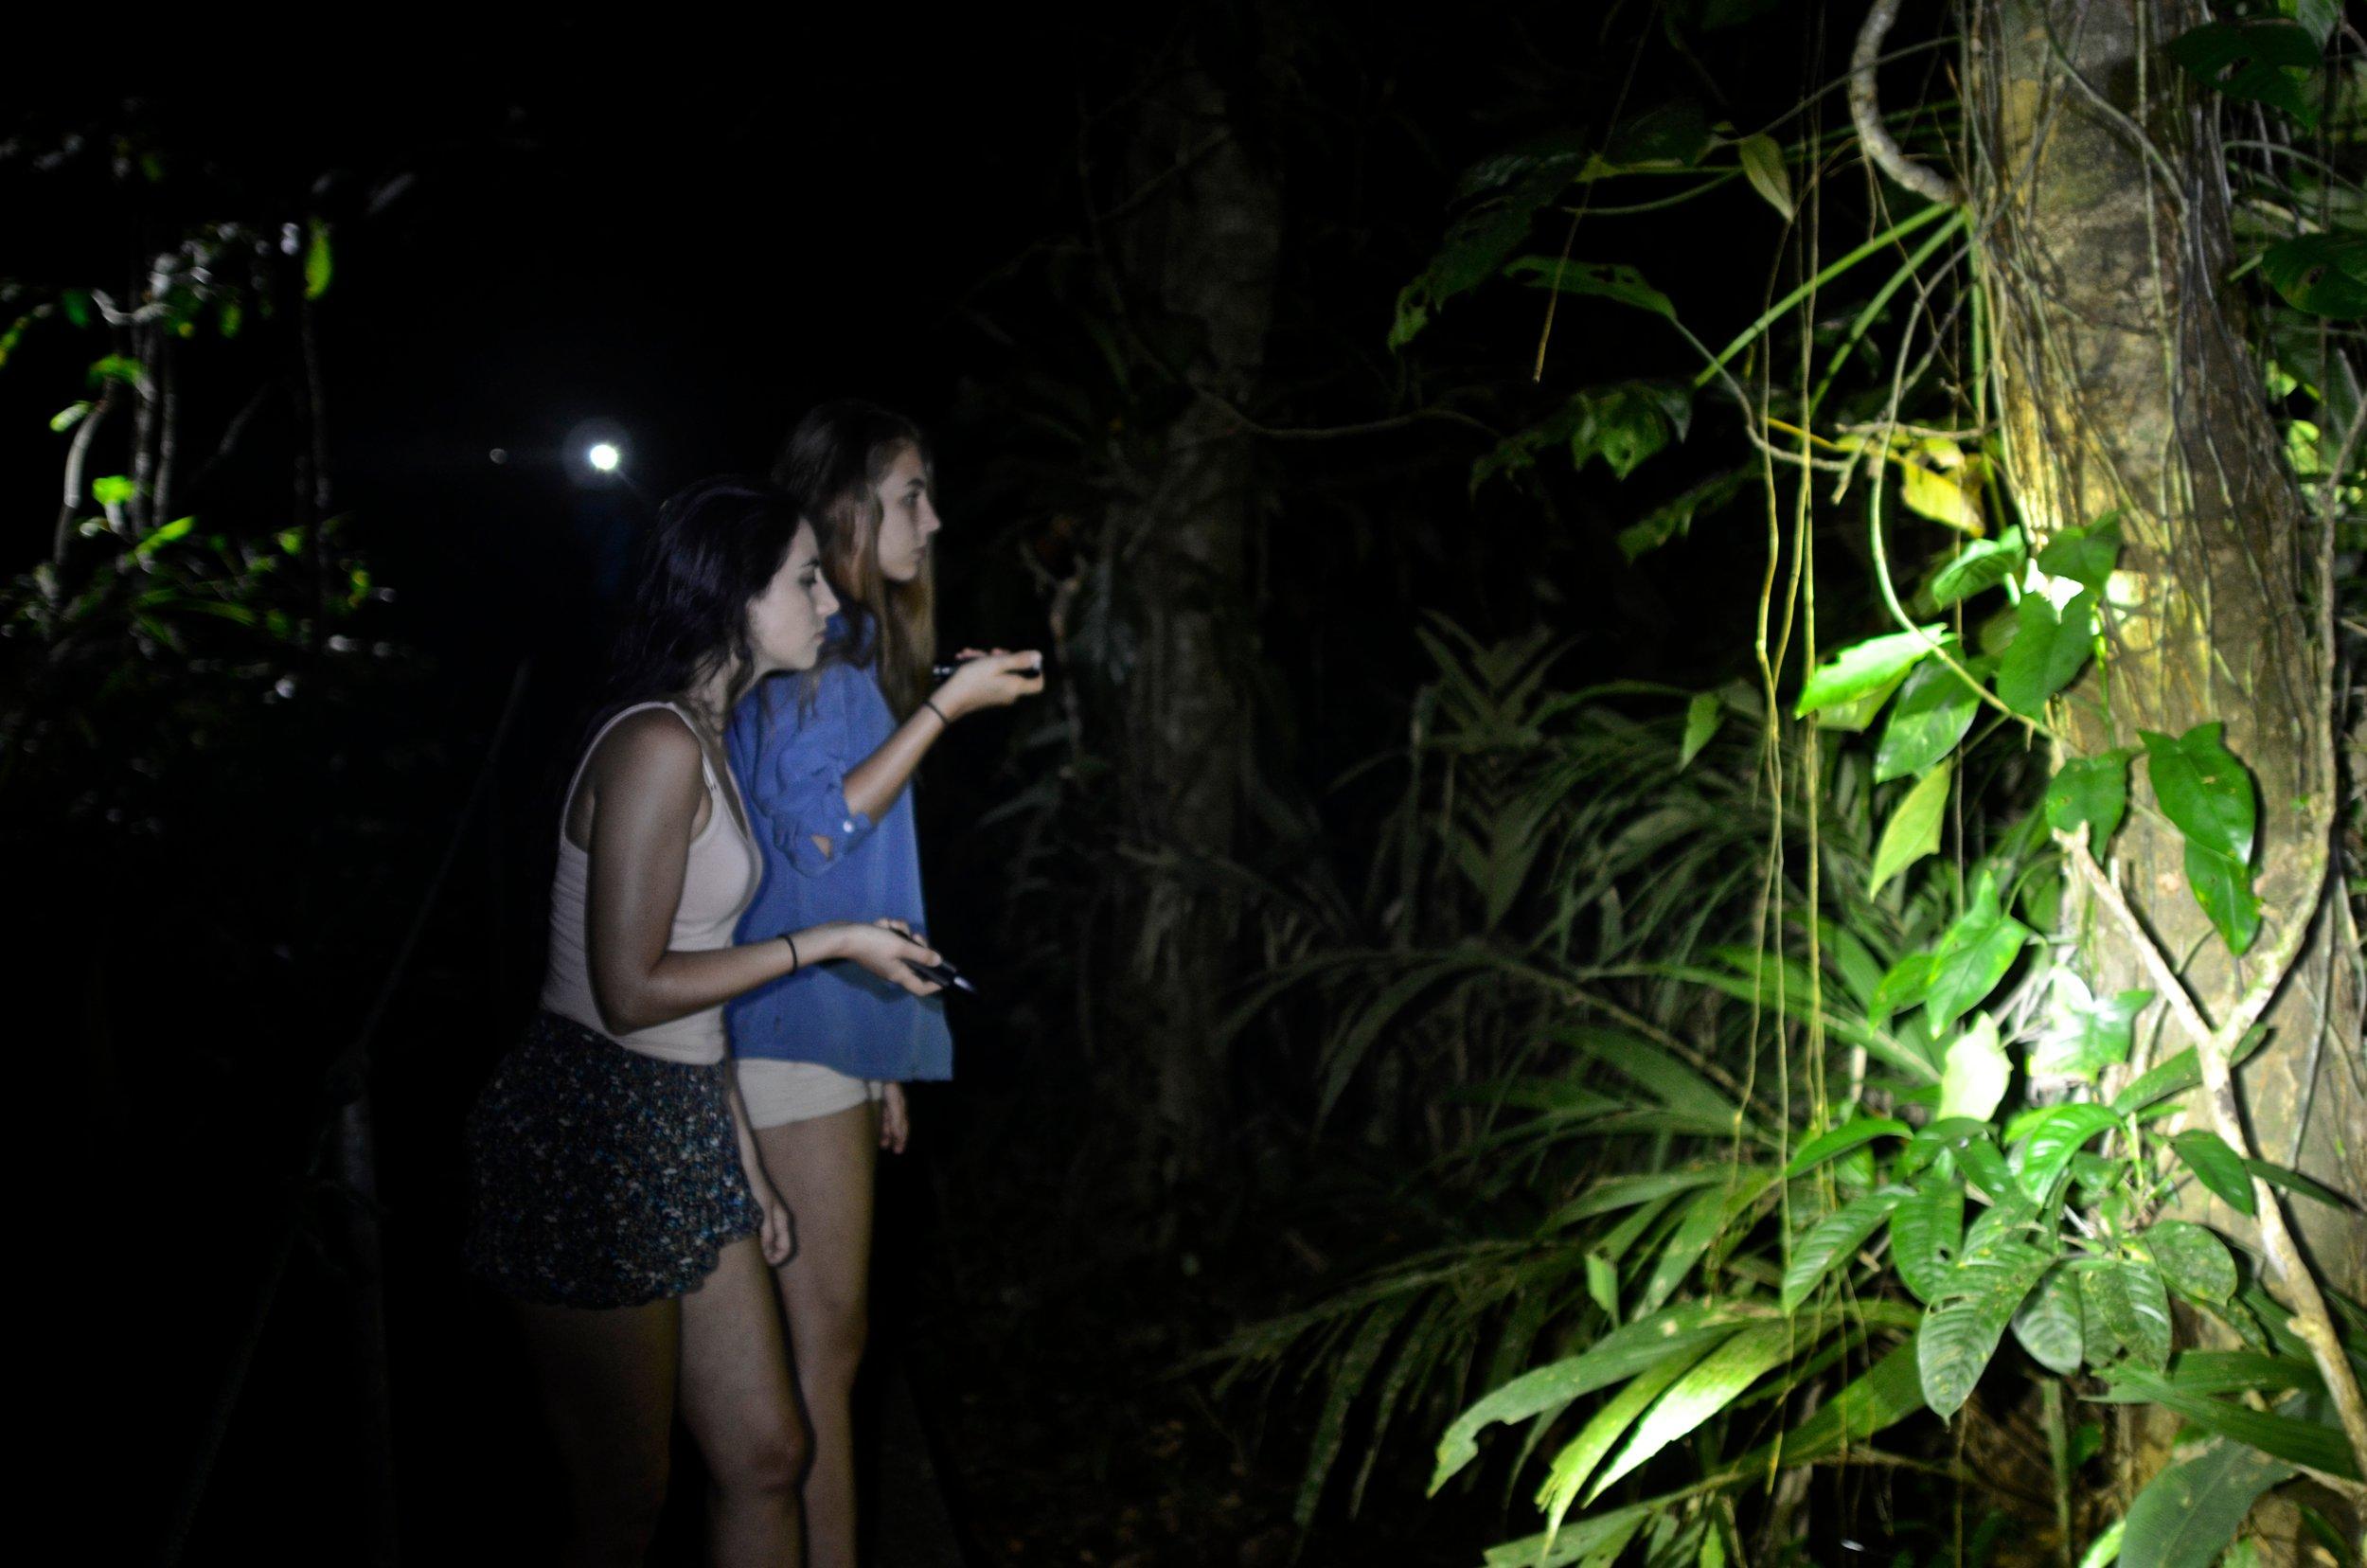 caminata nocturna4.jpg